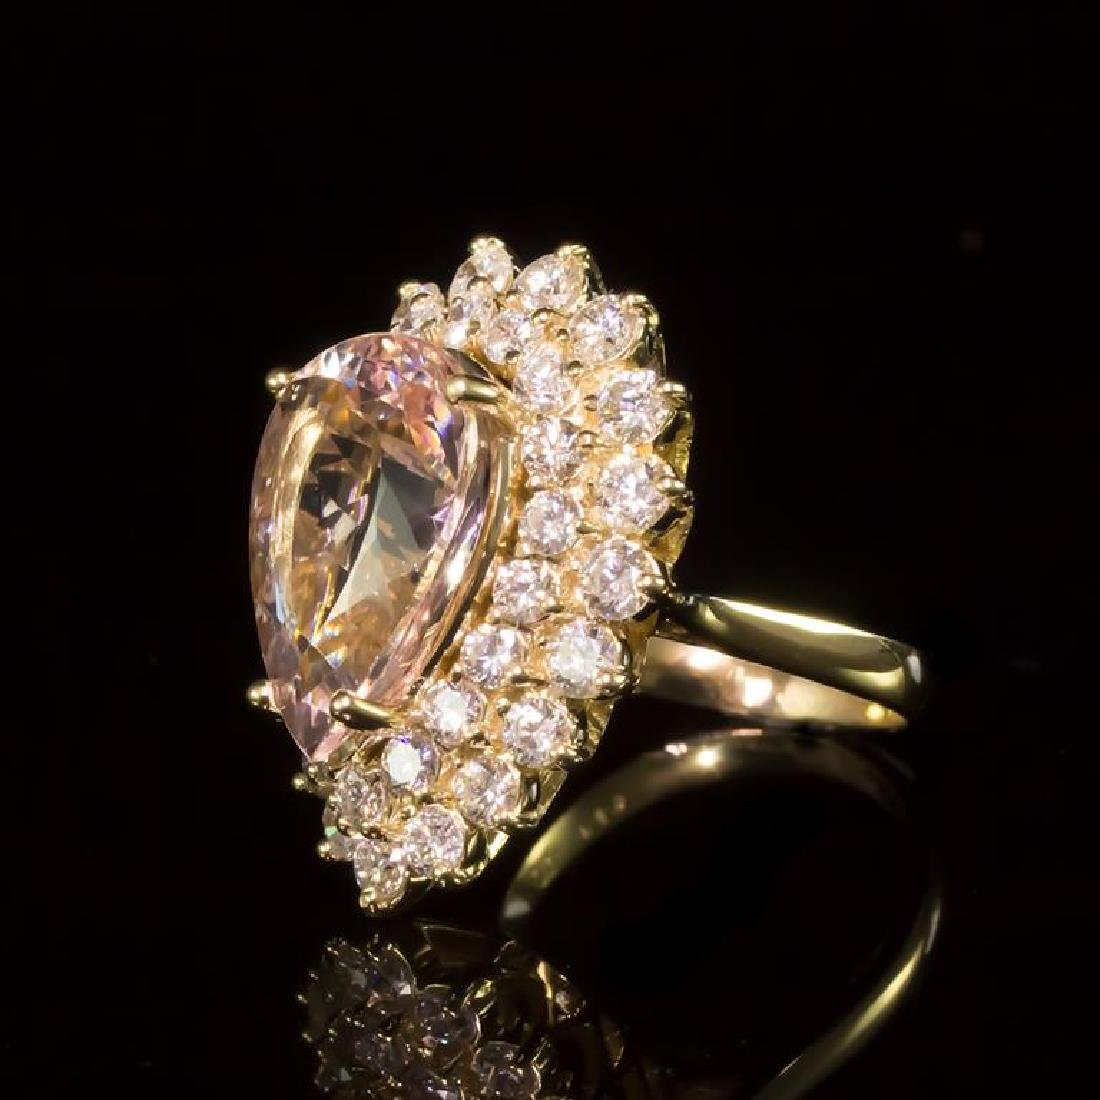 14K Gold 6.88ct Morganite 2.67ct Diamond Ring - 2